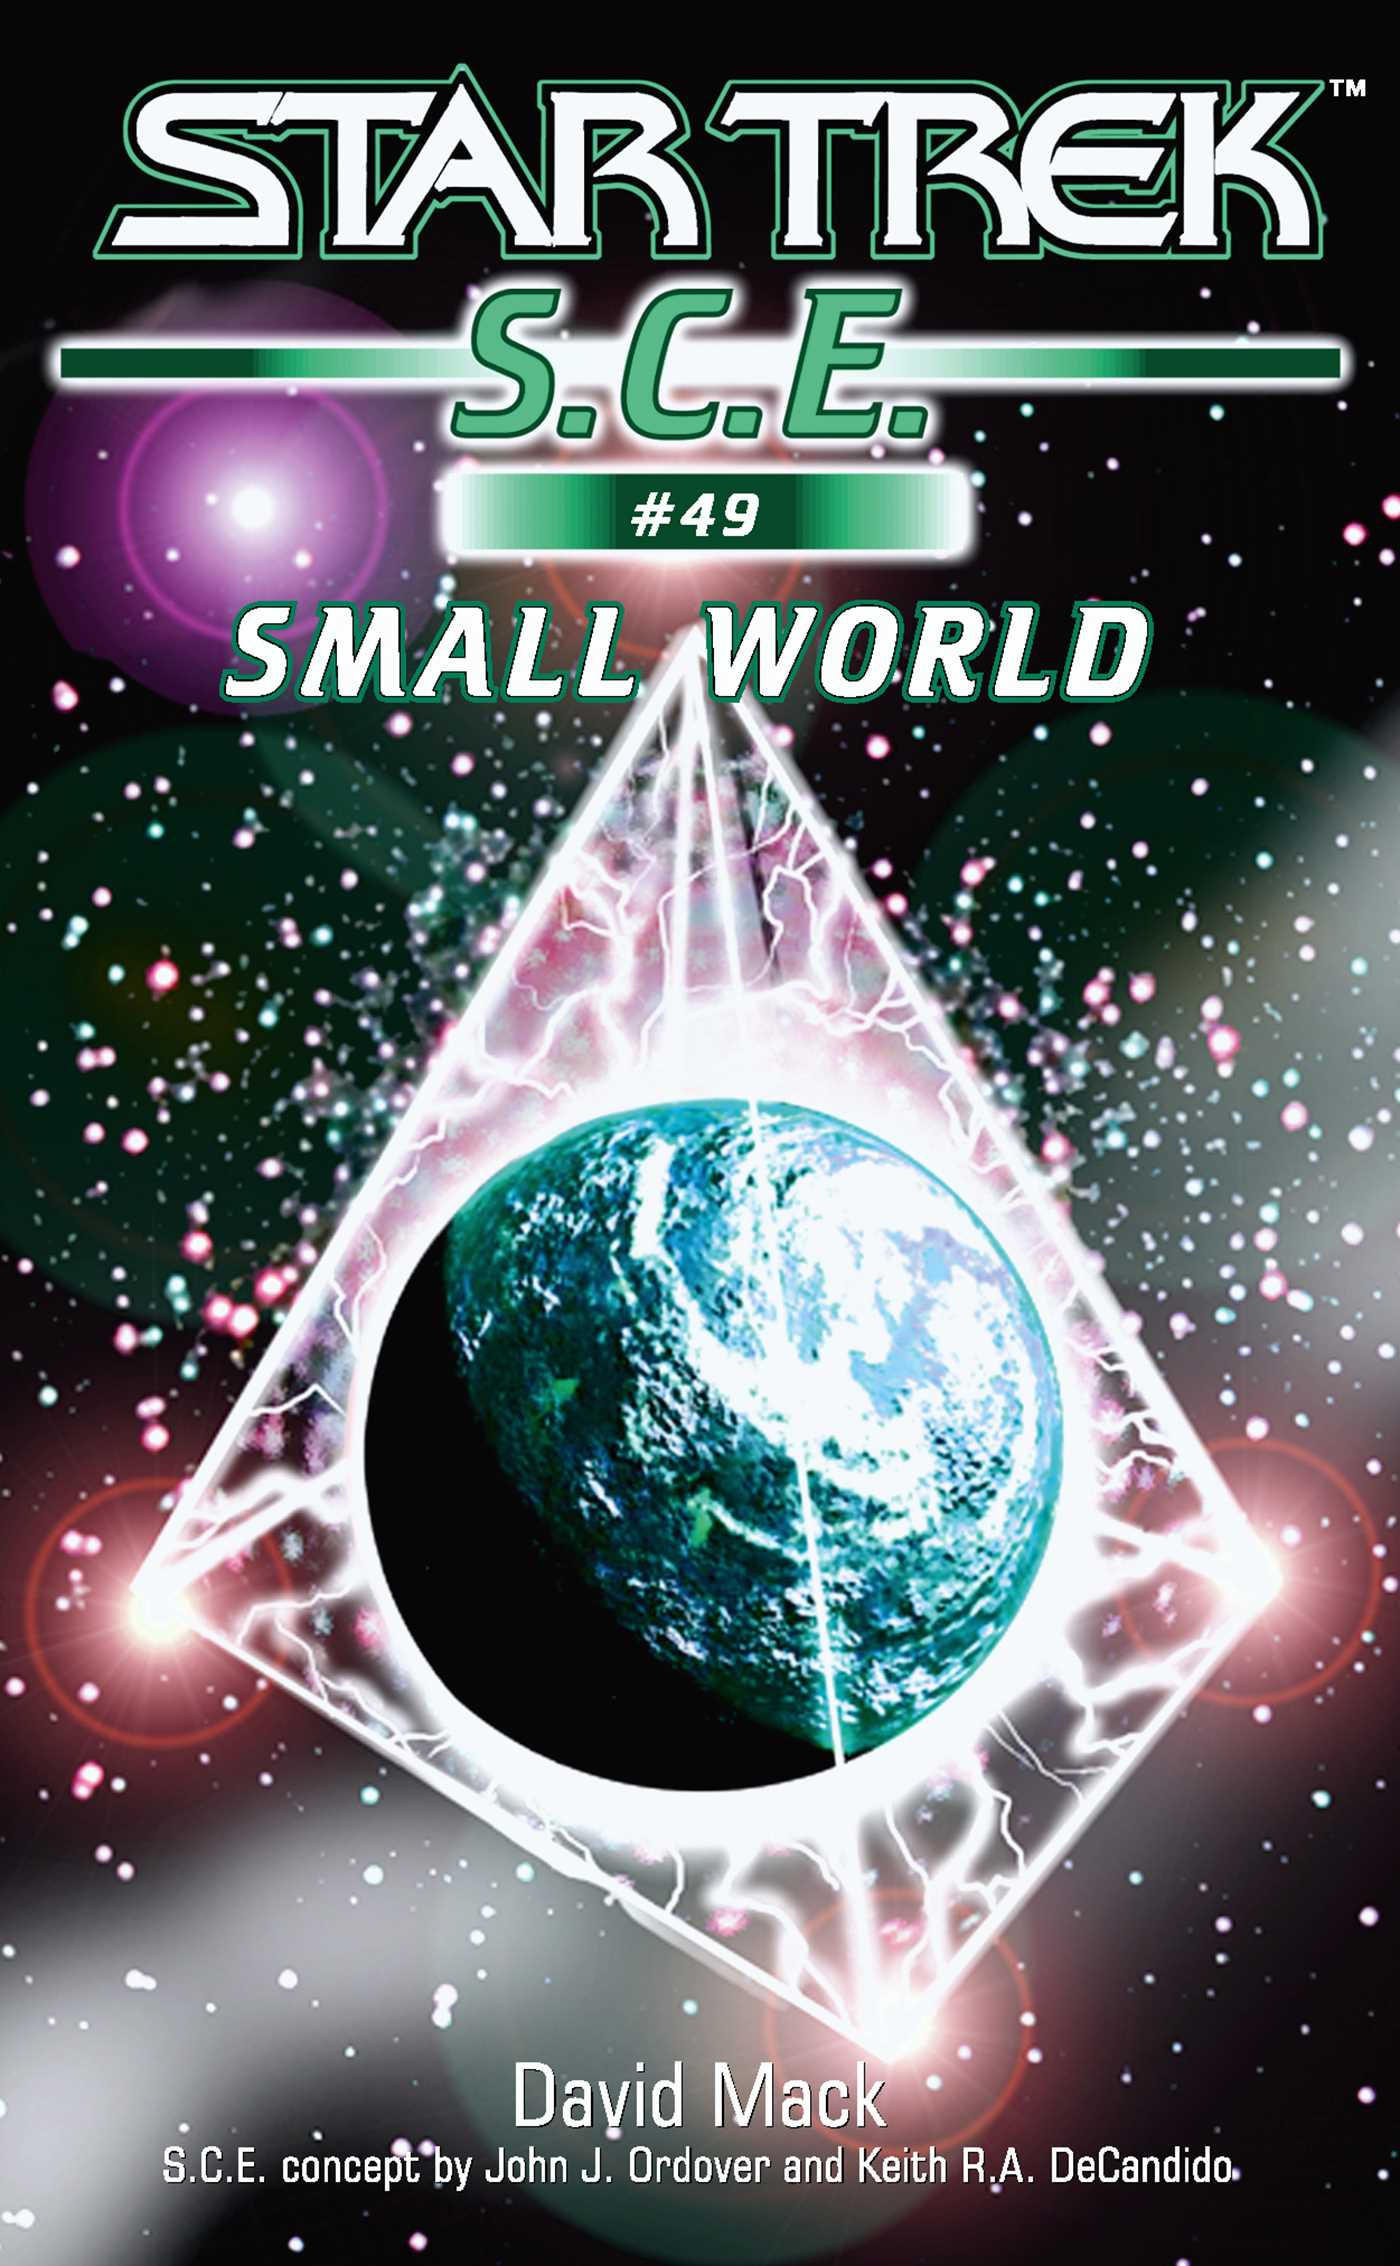 Star trek small world 9780743496902 hr